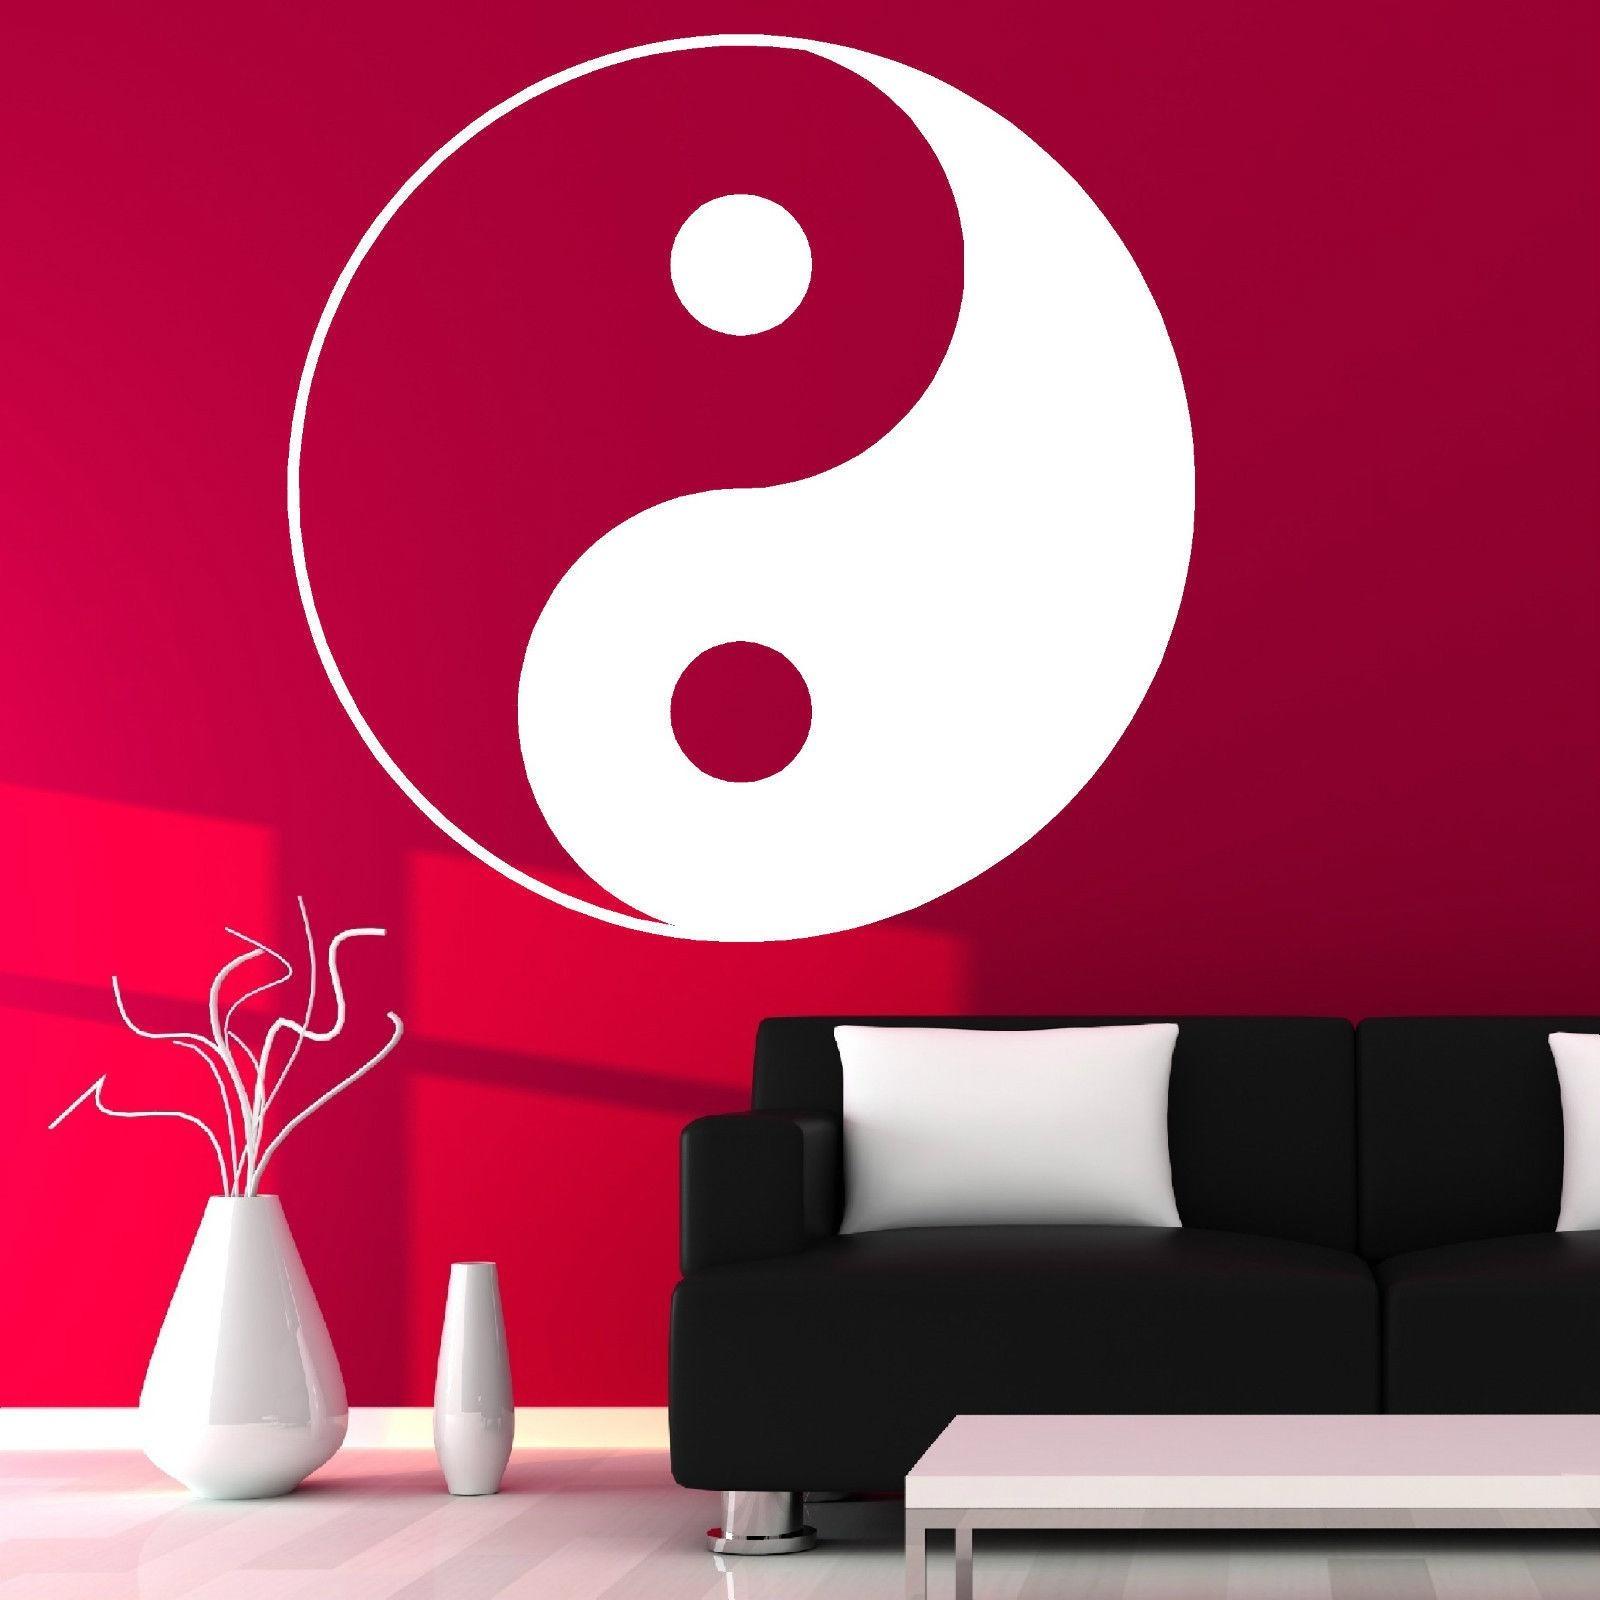 Aliexpress : Buy D189 Yin Yang Symbol Ying Yang Wall Art Room Inside Chinese Symbol Wall Art (View 2 of 20)